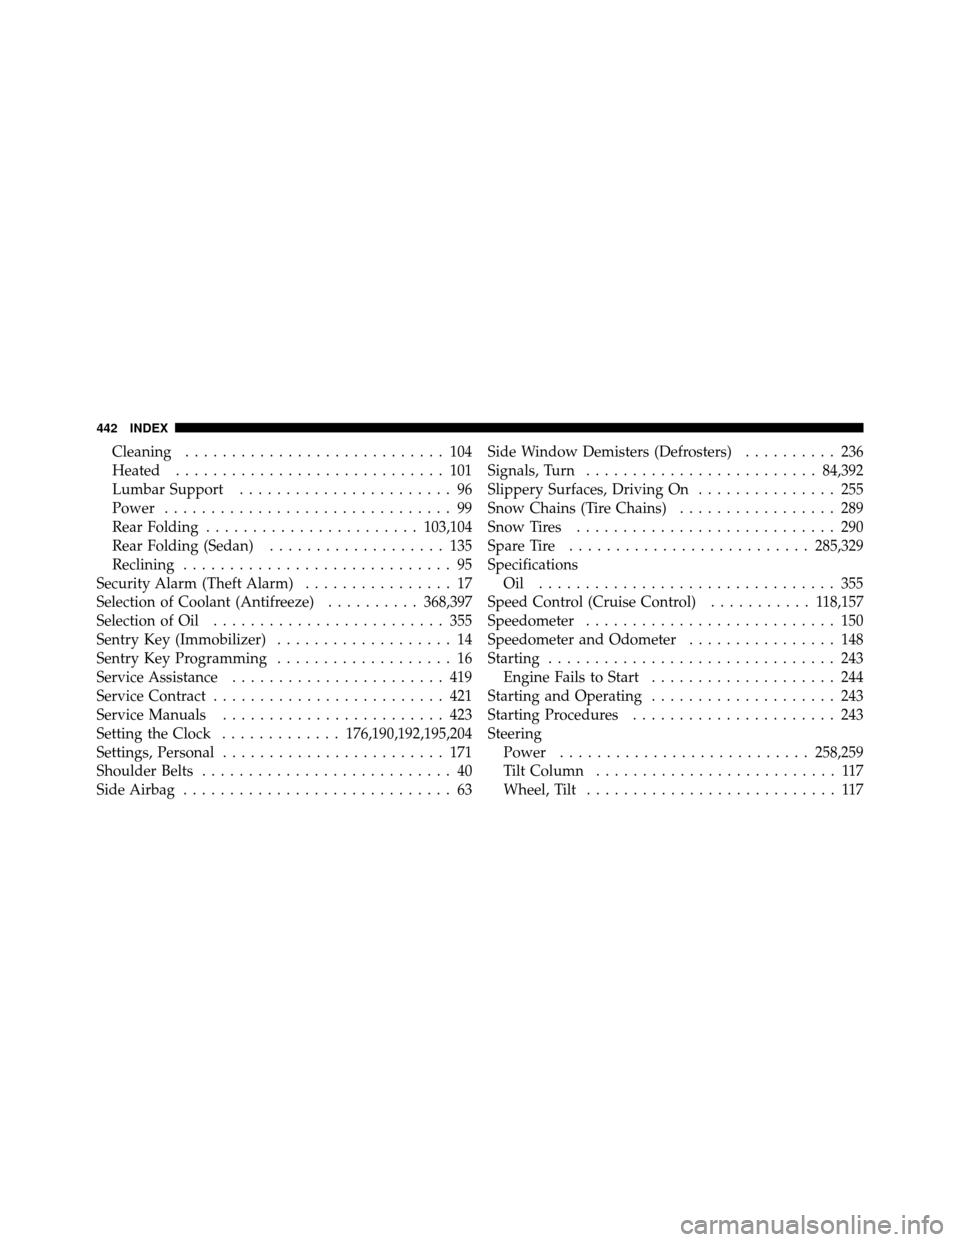 DODGE AVENGER 2010 2.G Owners Manual